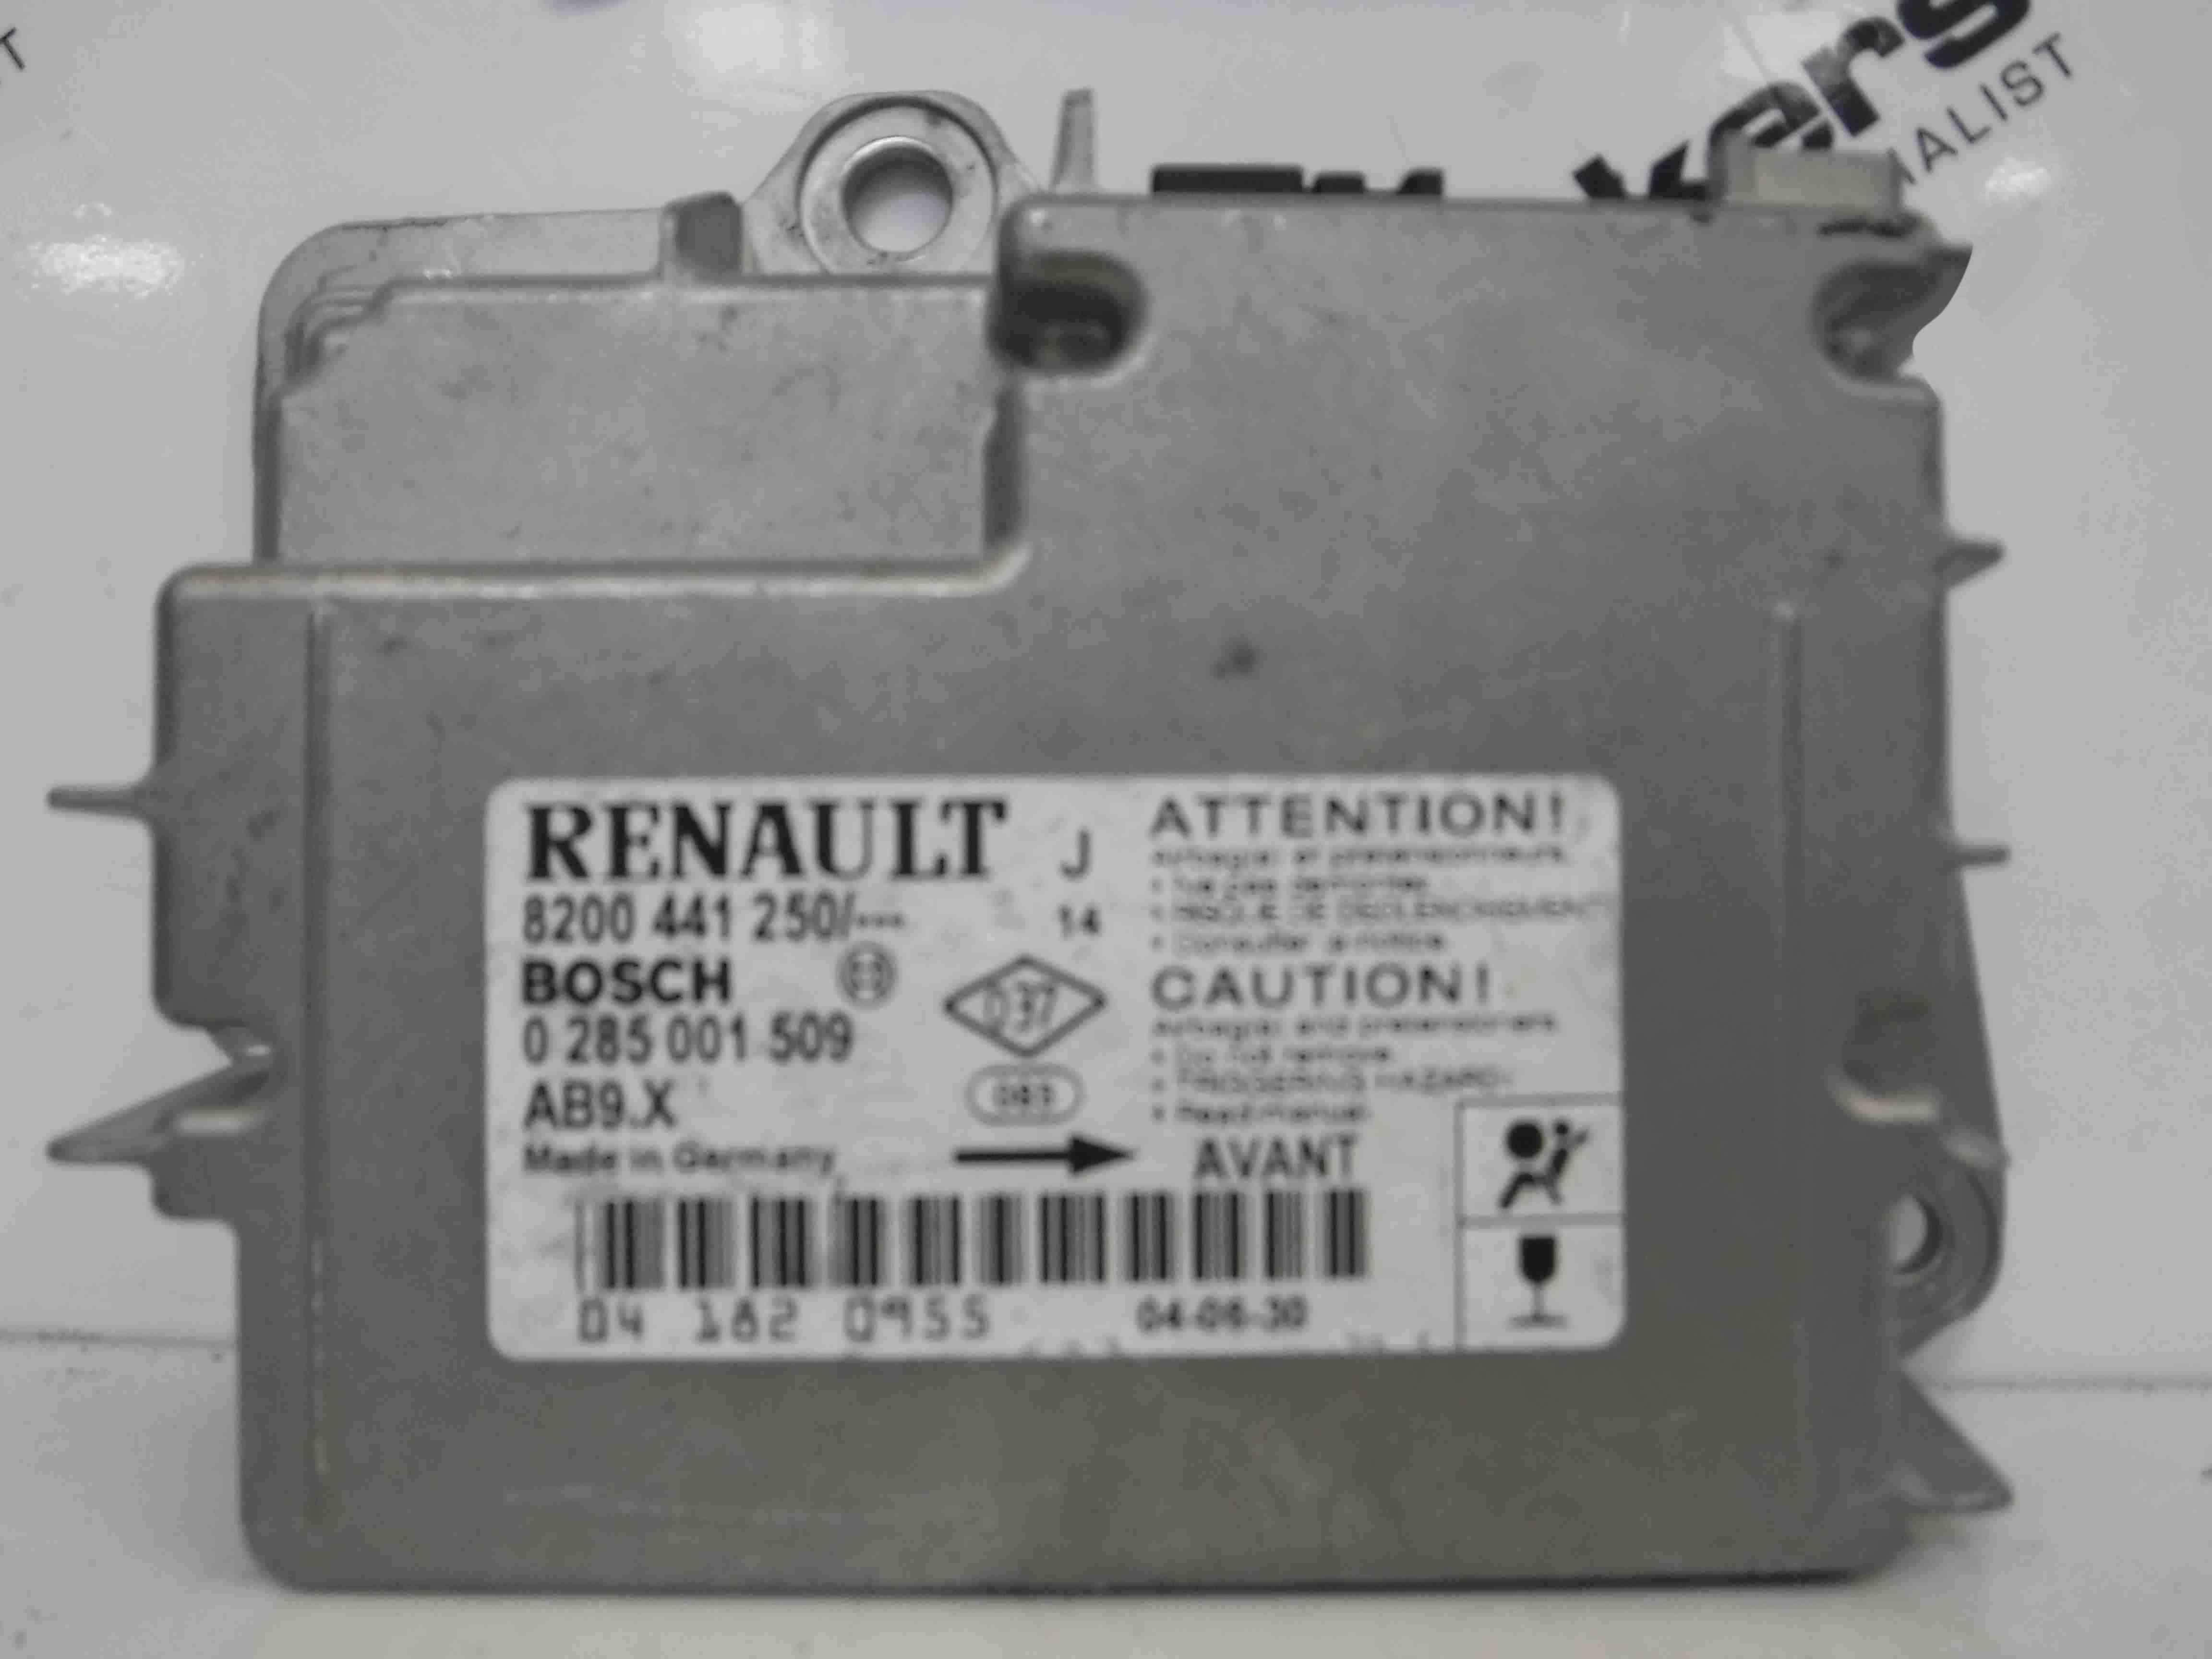 Renault Modus 2004-2008 Airbag ECU Module Computer 8200441250